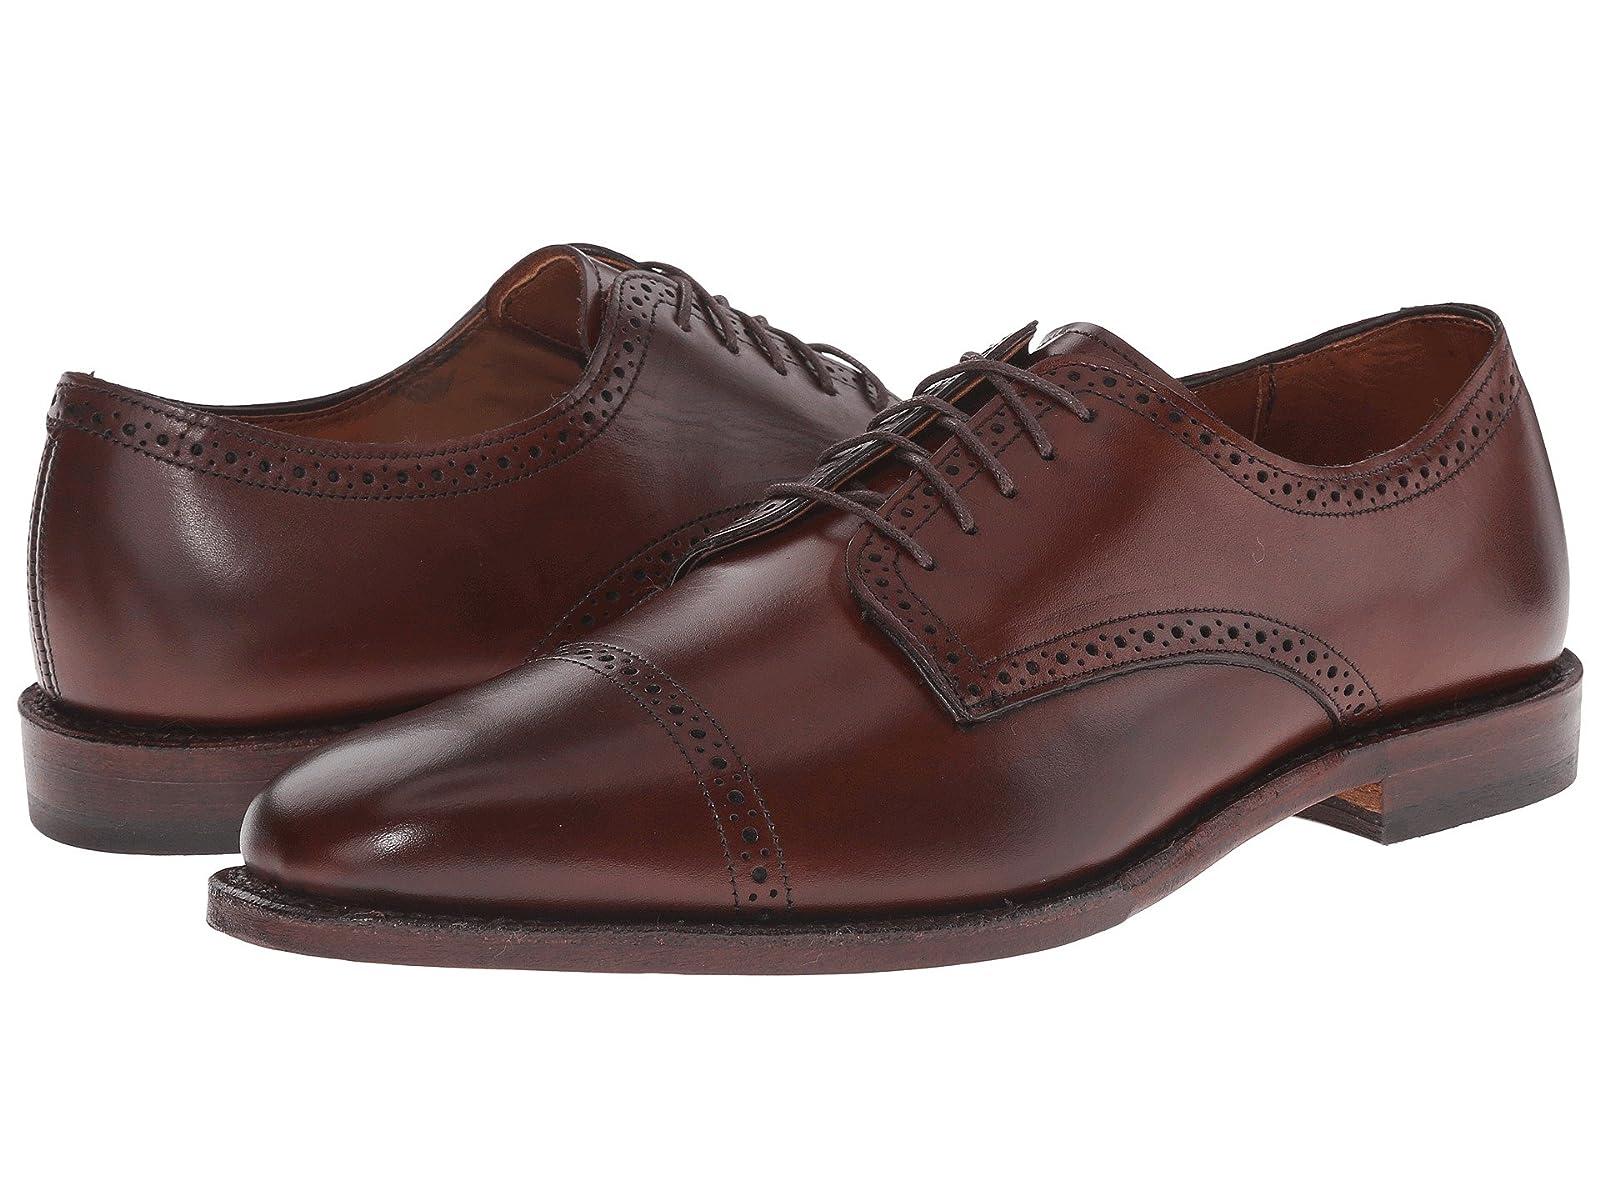 Allen Edmonds YorktownCheap and distinctive eye-catching shoes